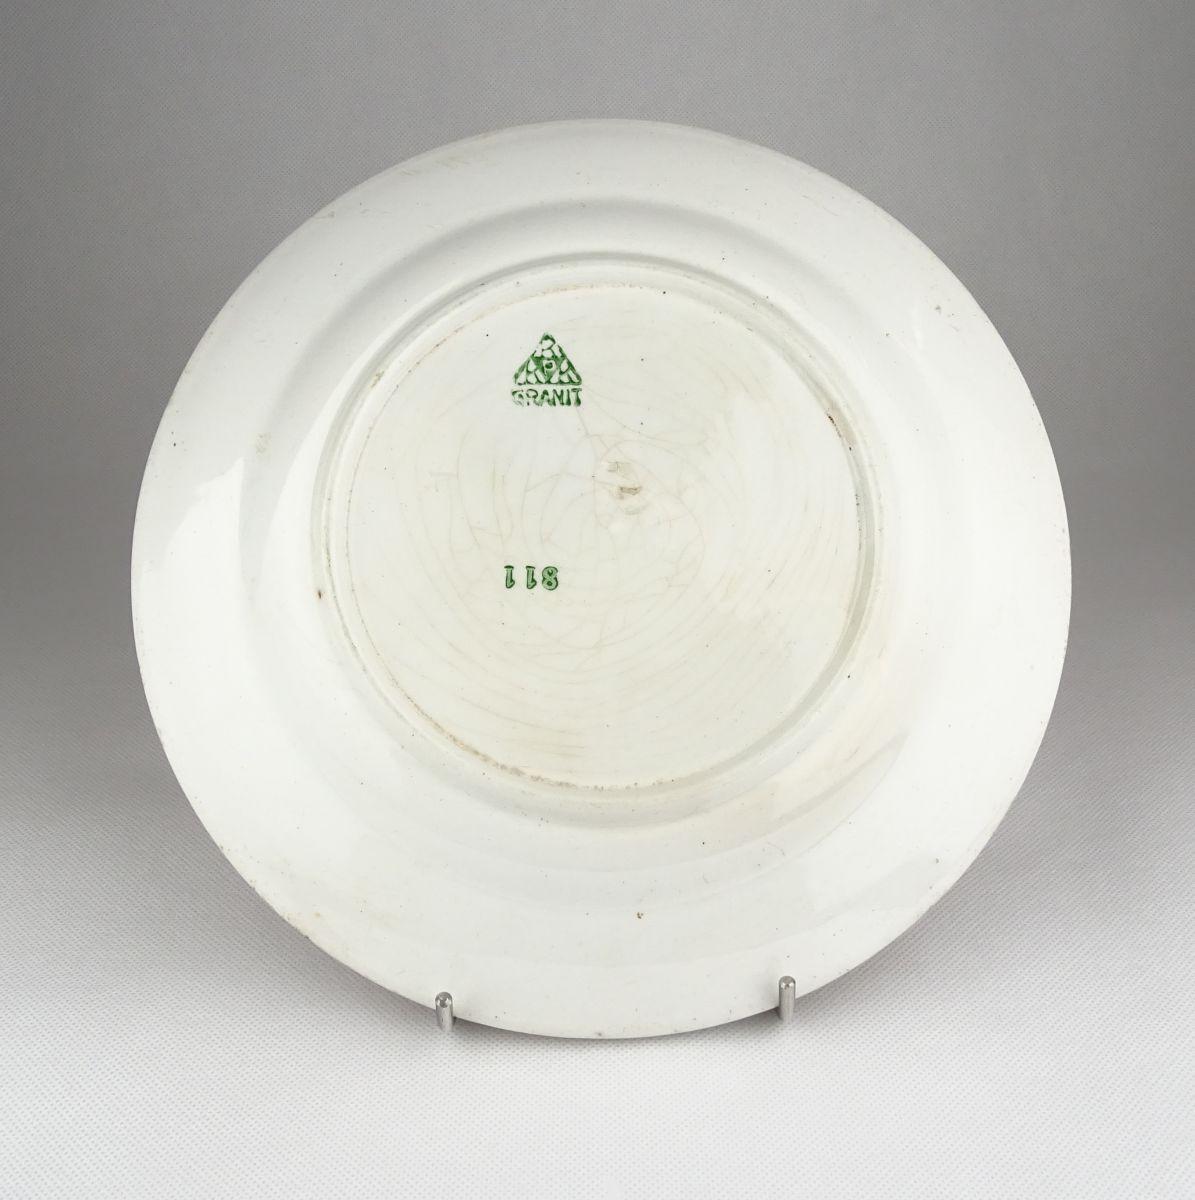 DSC09256.JPG (1195×1200)